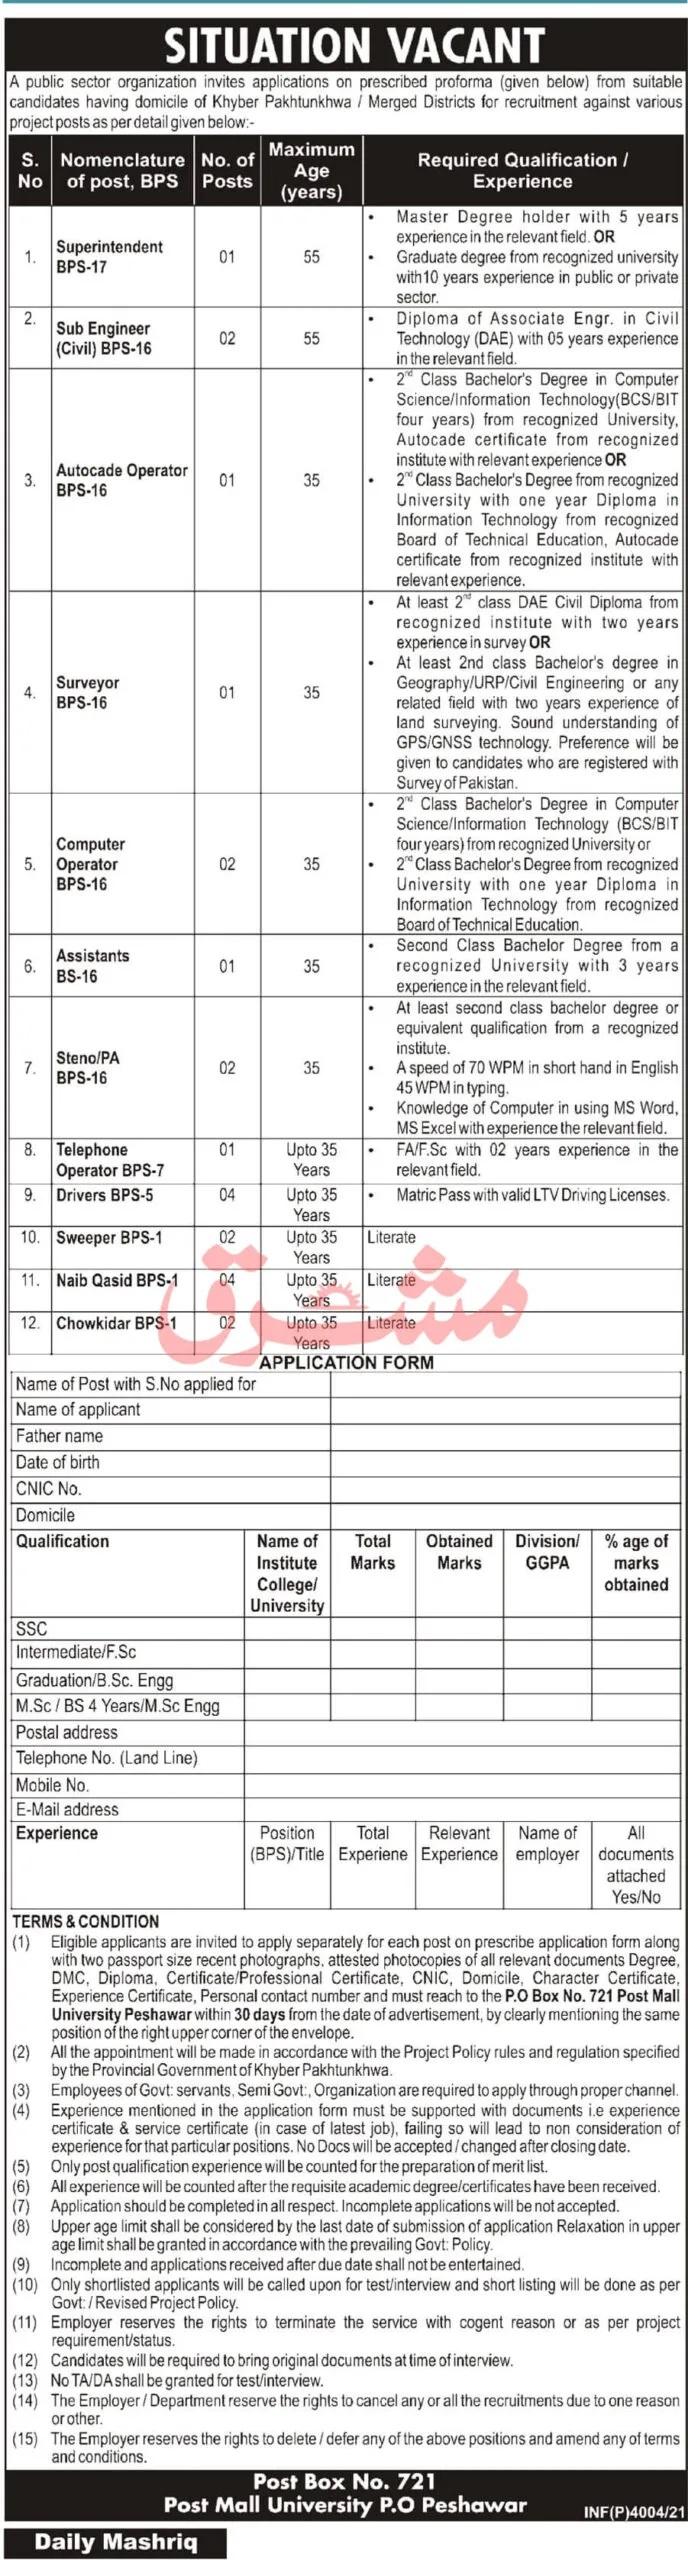 KPK Government Jobs Today At Public Sector Organization PO Box 721